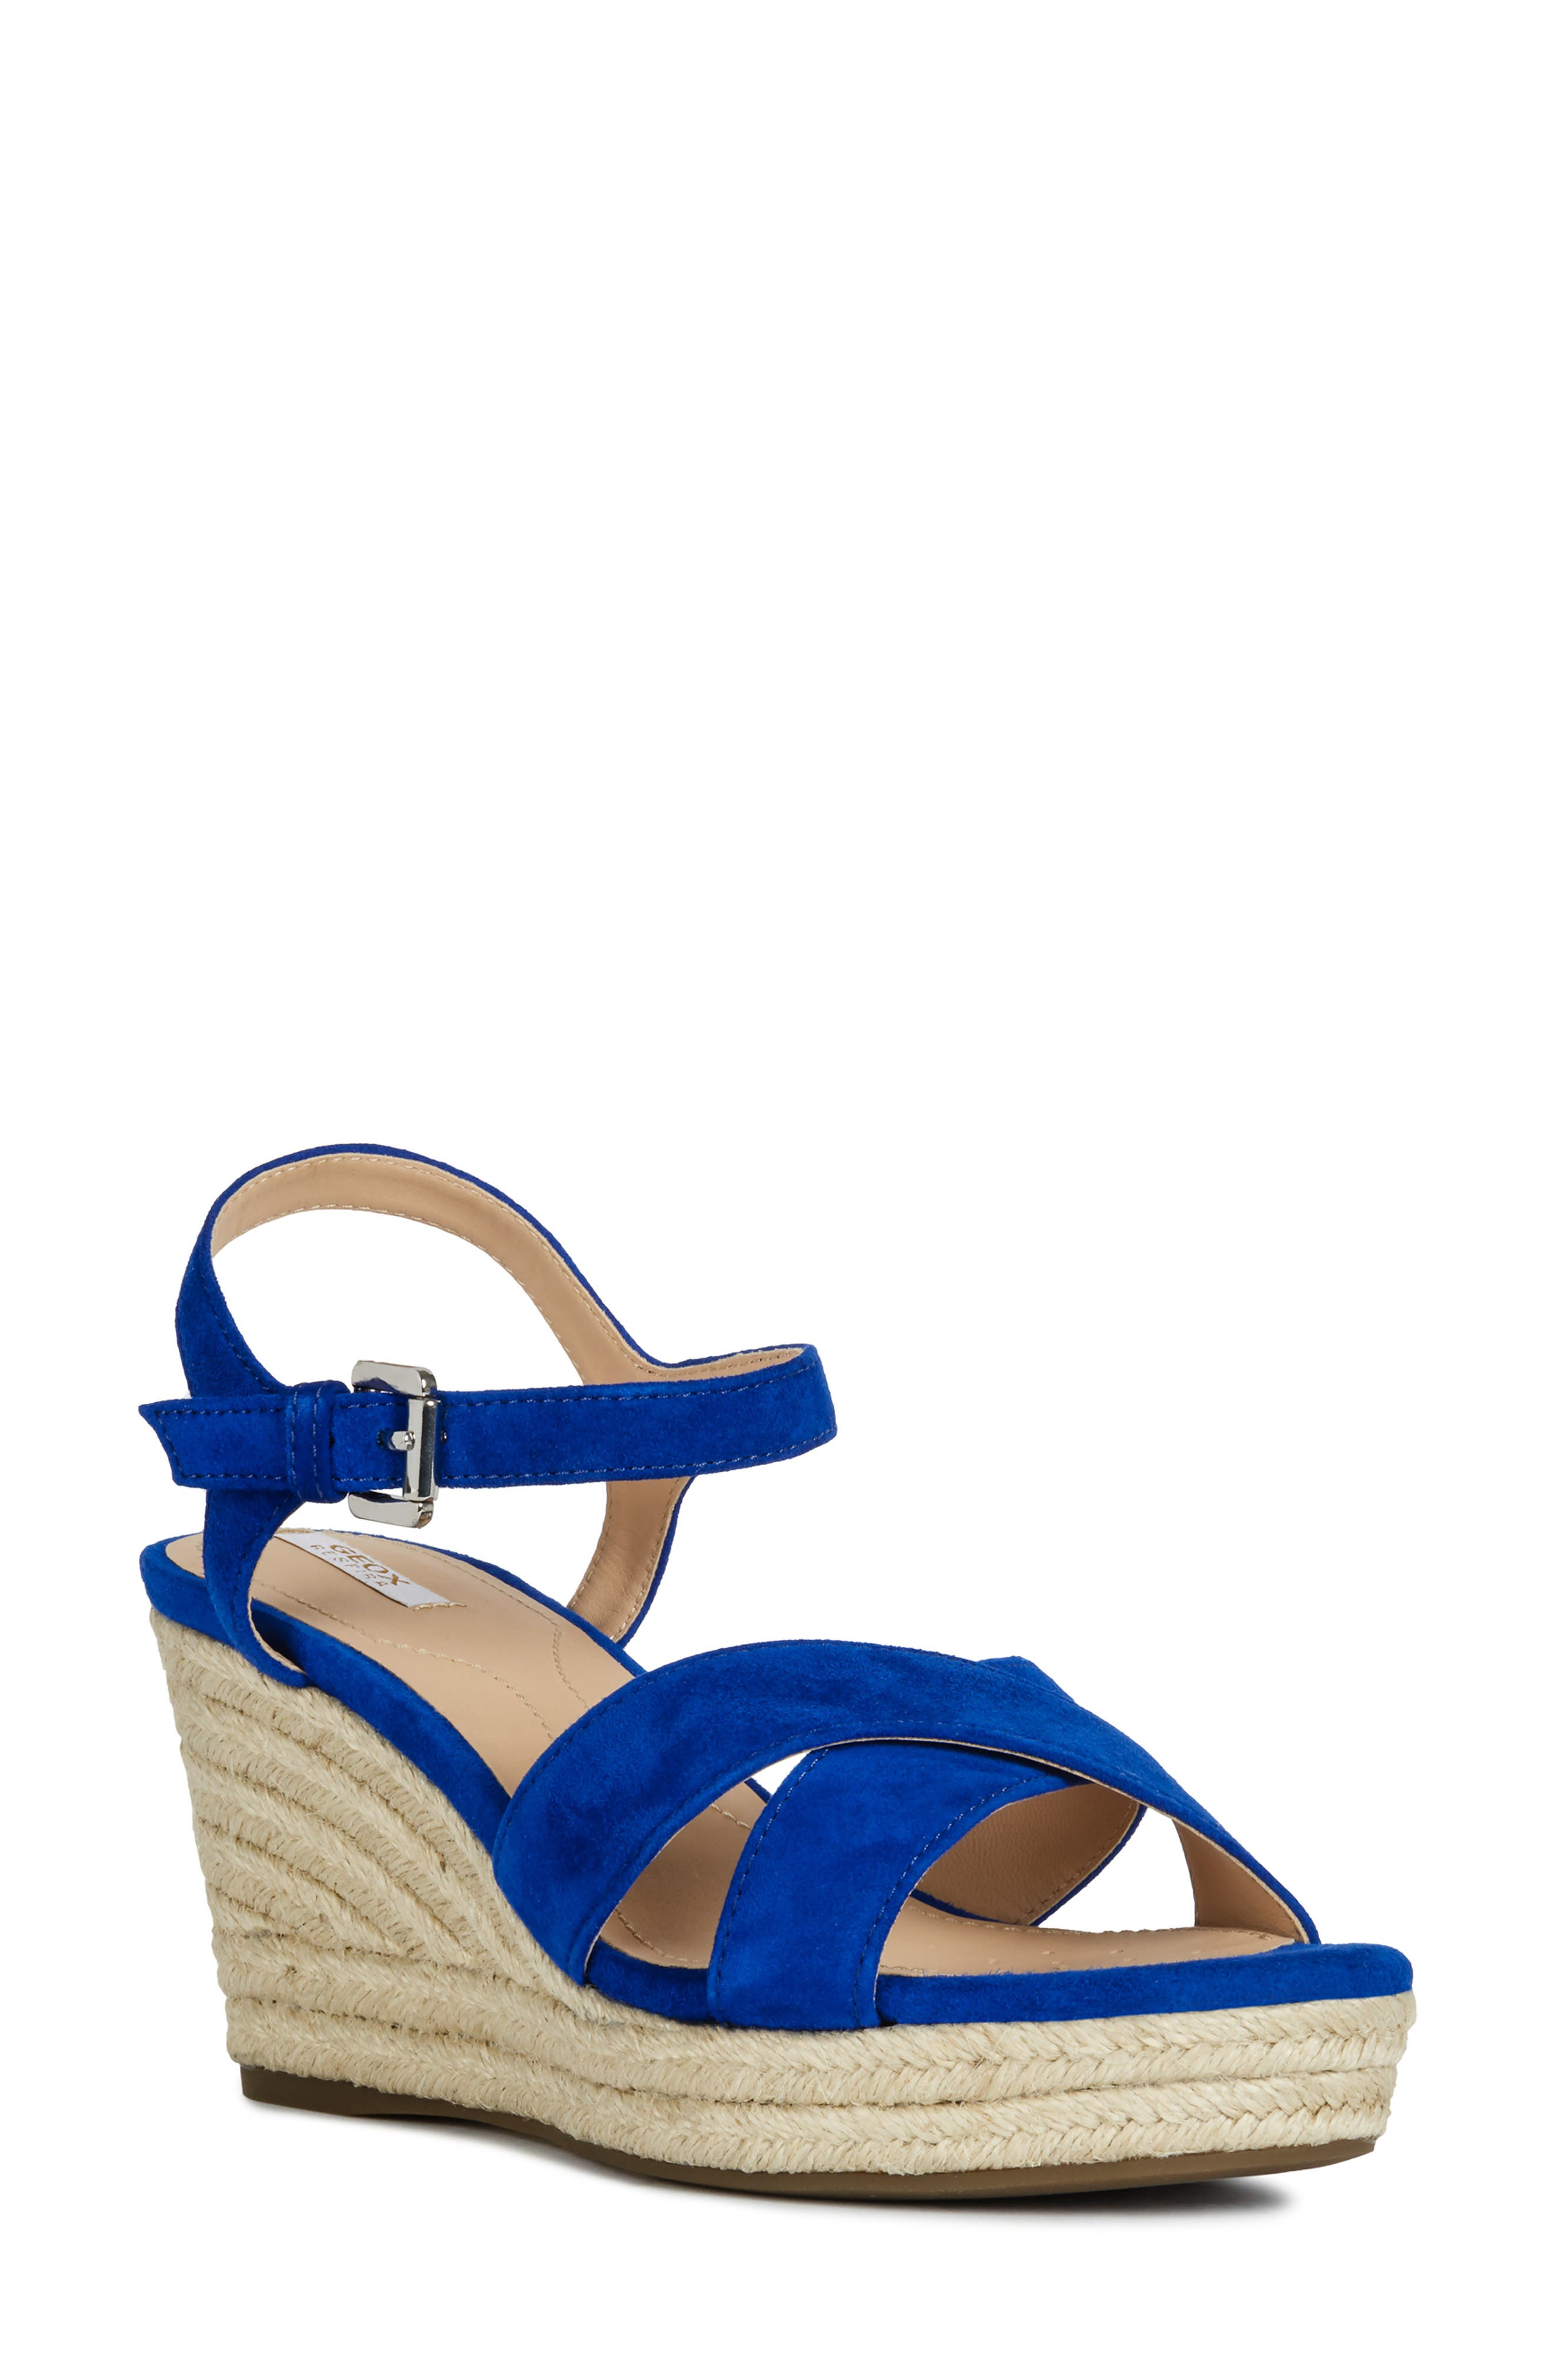 Geox Soleil Wedge Sandal, Blue